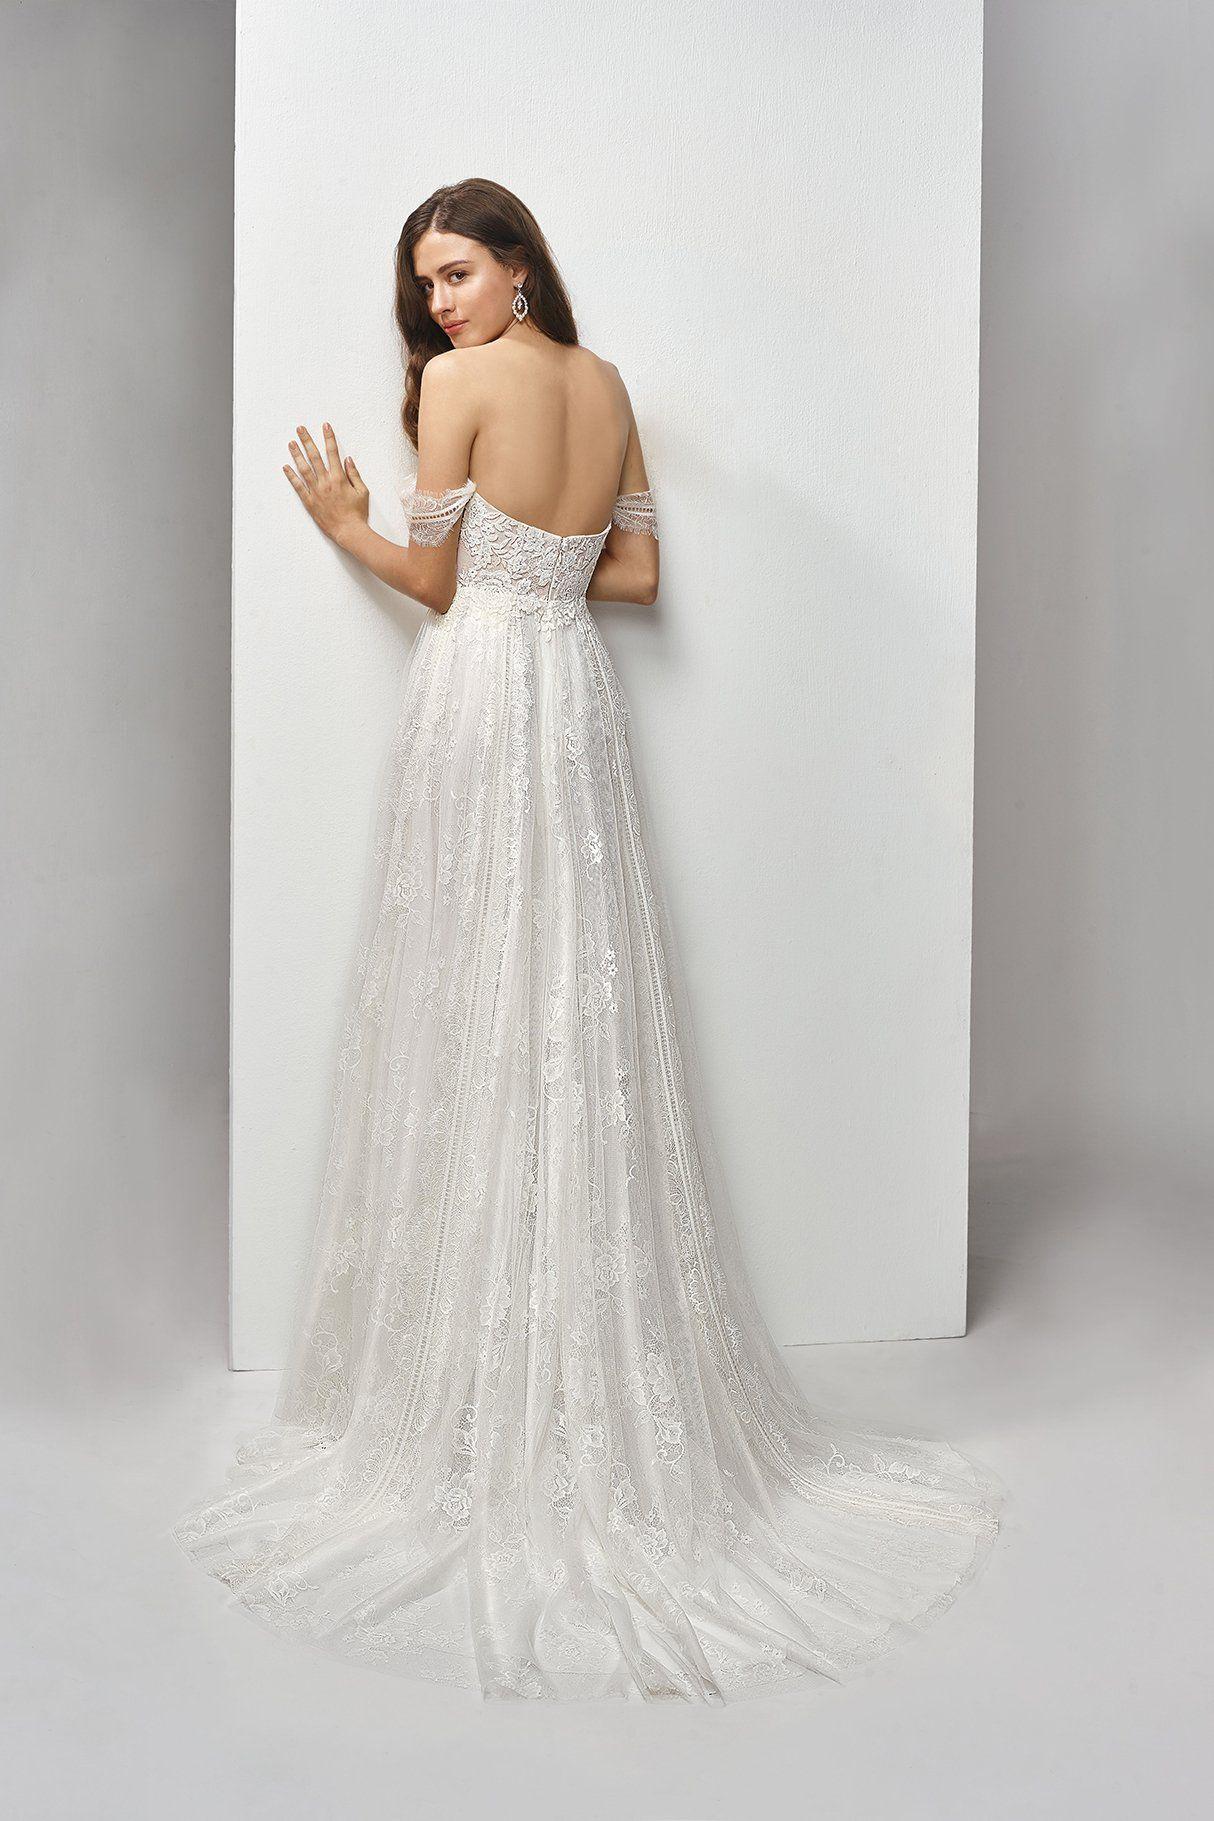 Bronte Gown Beautiful By Enzoani Eternal Bridal Drop Waist Wedding Dress Boho Chic Wedding Dress A Line Wedding Dress